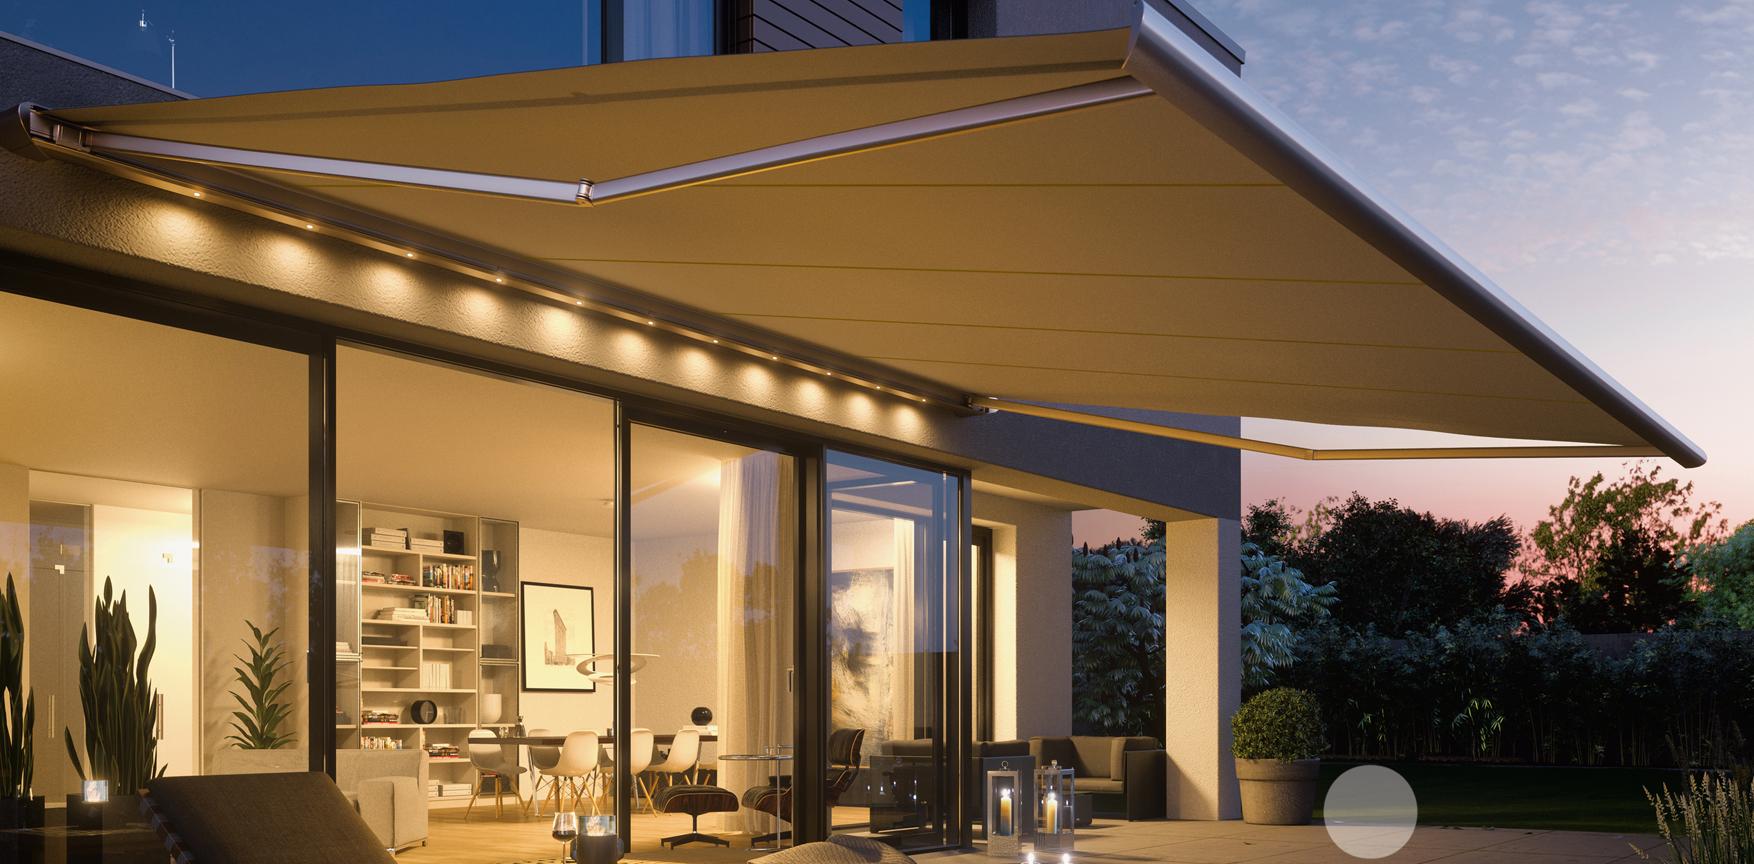 markisen geschft beautiful markisen nrnberg nrnberg folienrollo heinikel in with markisen. Black Bedroom Furniture Sets. Home Design Ideas